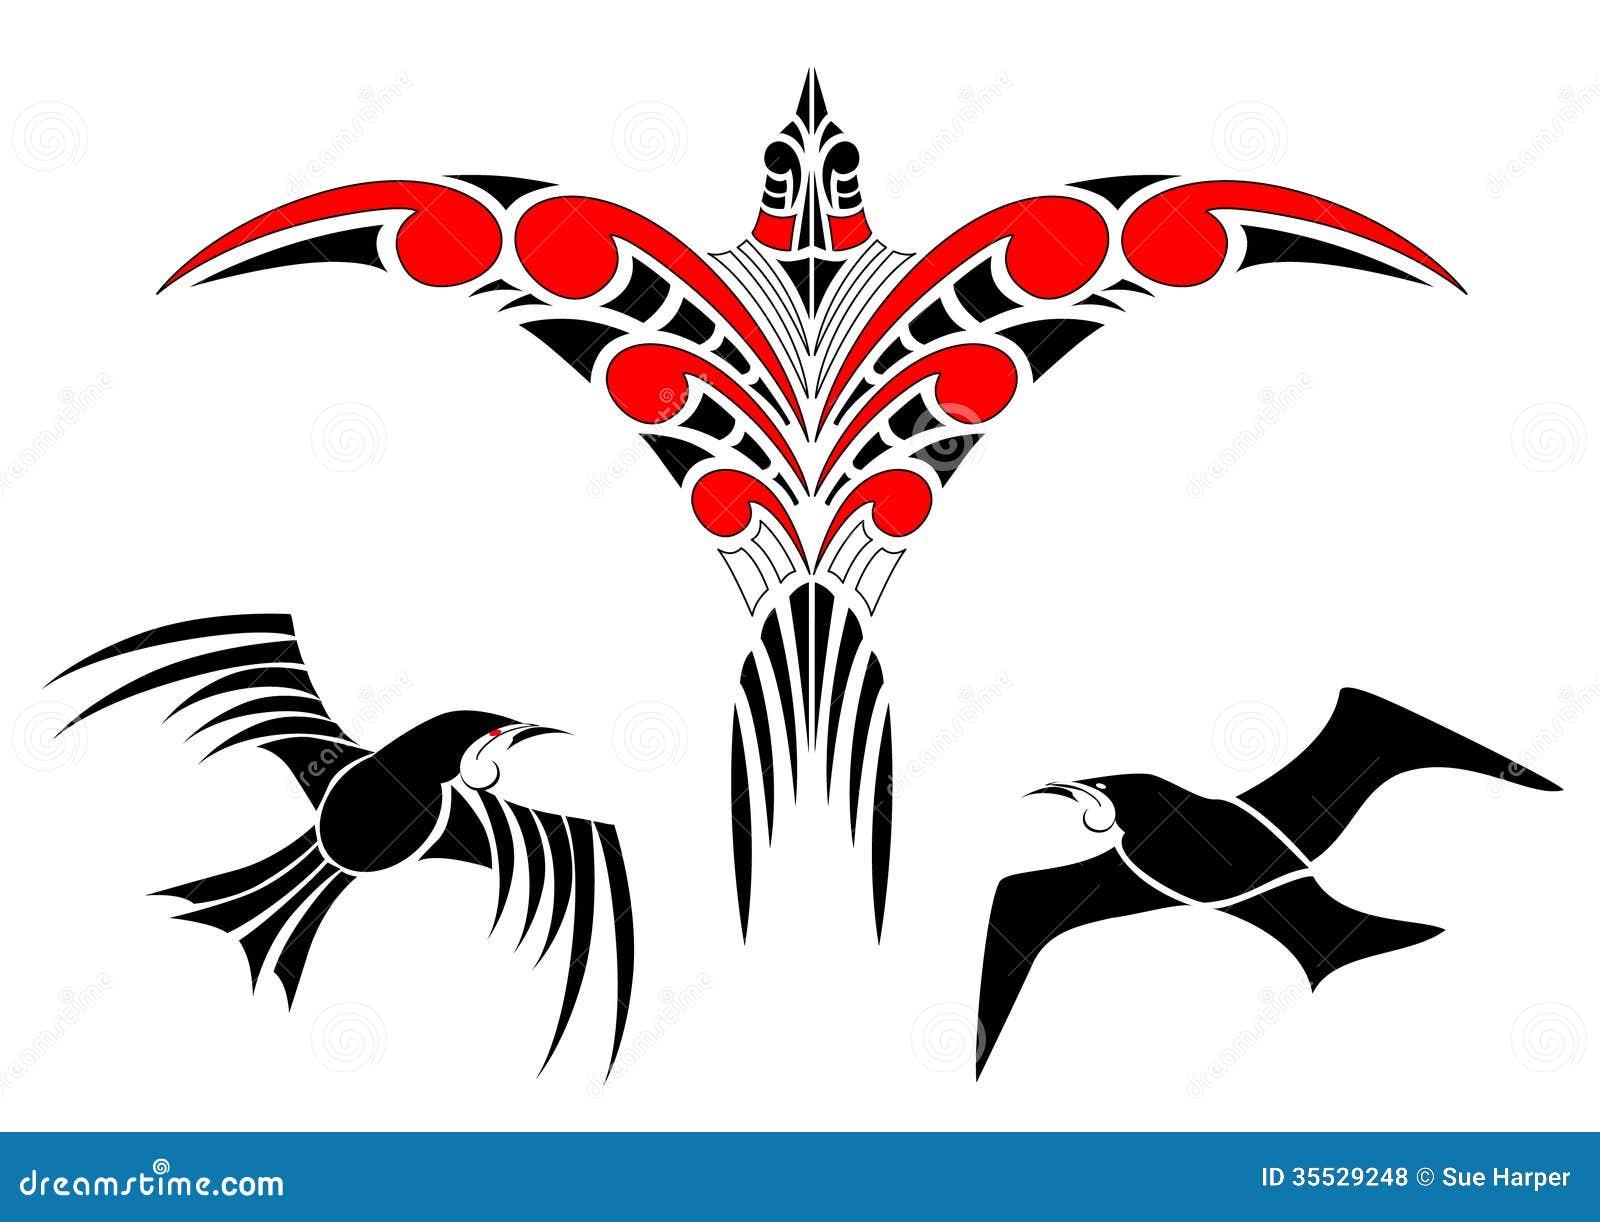 maori koru bird designs avec tui illustration de vecteur image 35529248. Black Bedroom Furniture Sets. Home Design Ideas